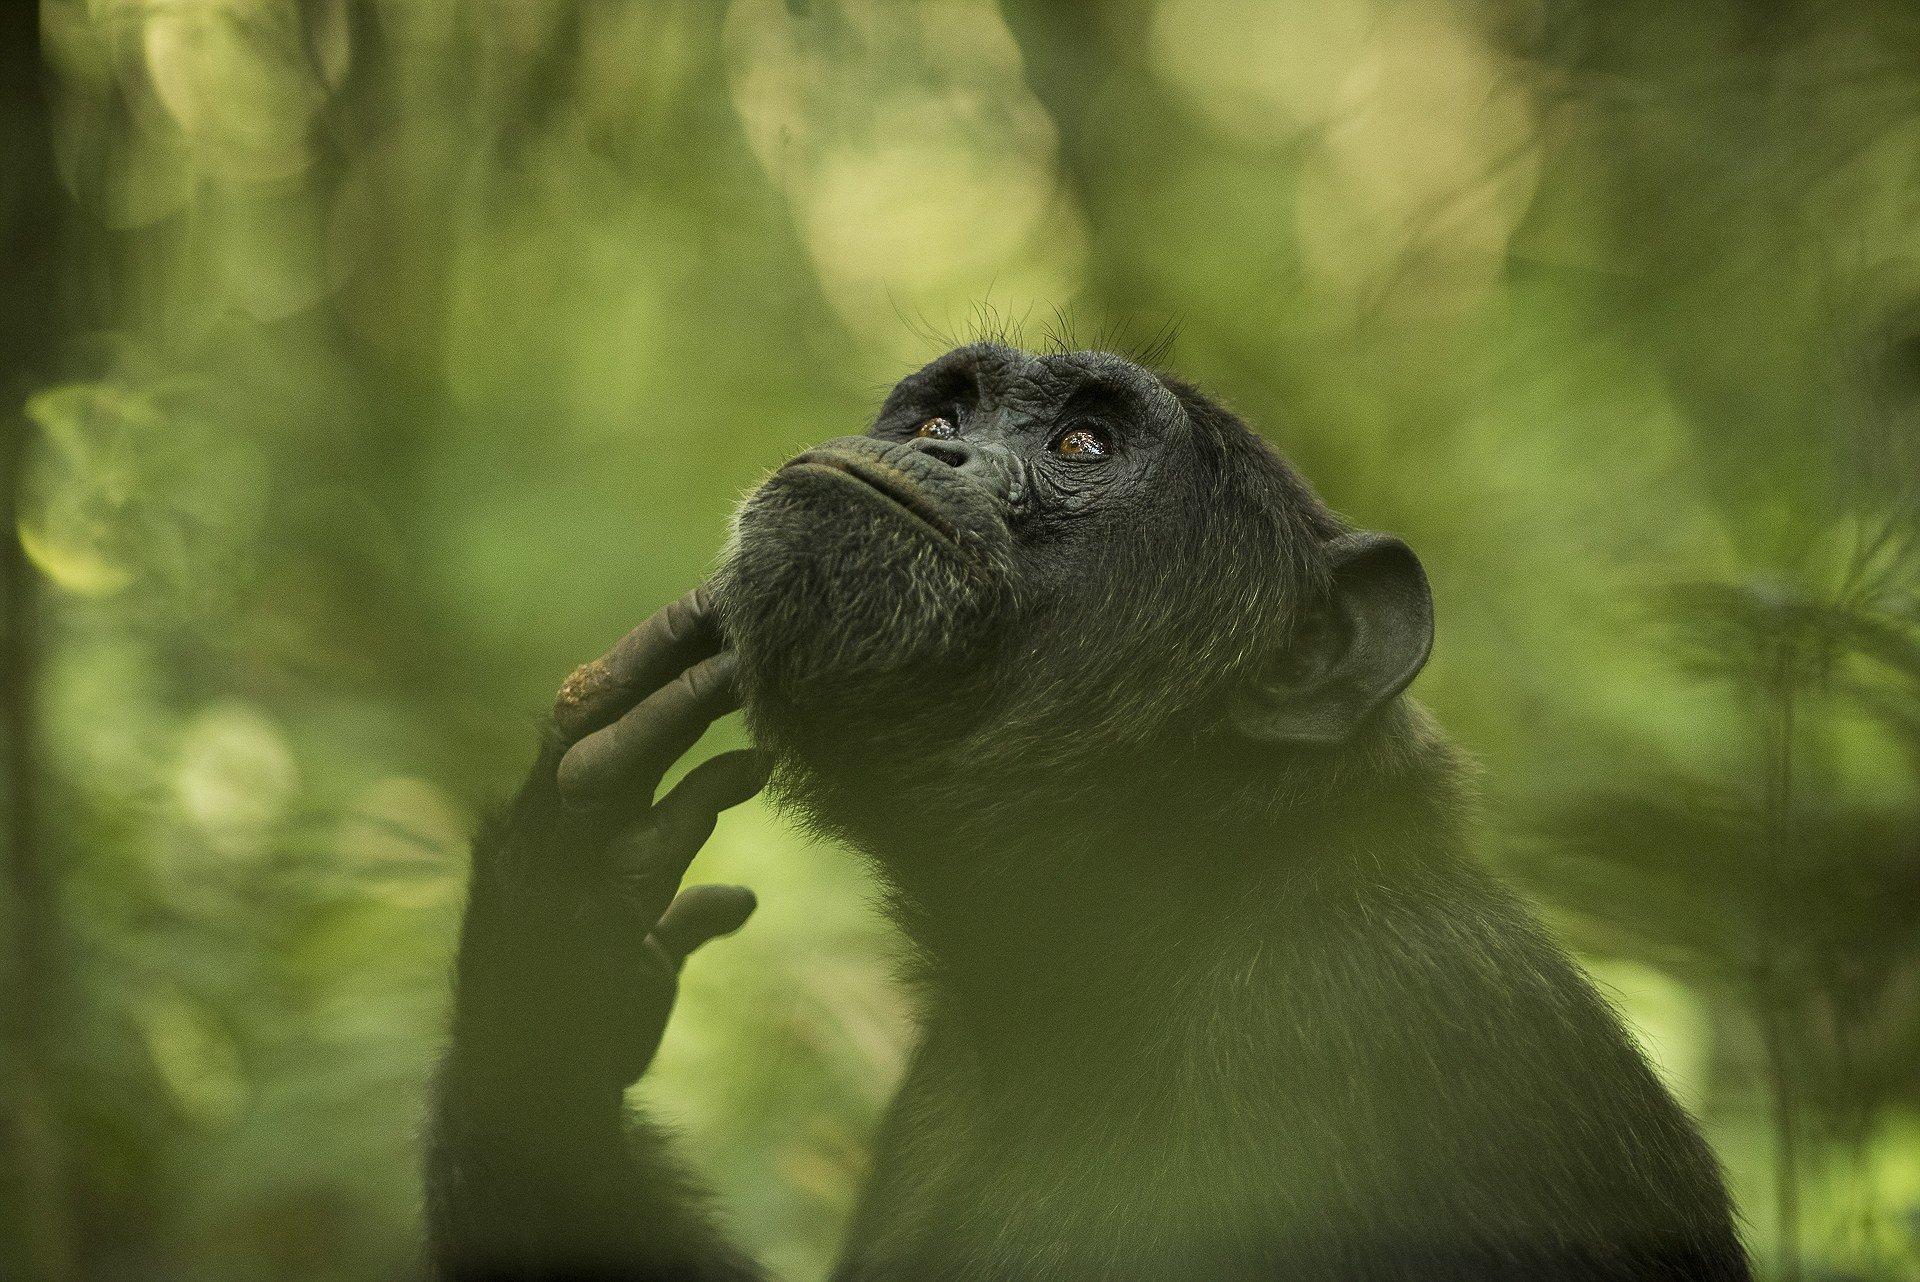 Шимпанзе в лесу Кибале, Уганда. Фотограф - Ингрид Векеманс Sony World Photography, Sony World Photography Awards 2018, лауреаты, лучшие фото, лучшие фотографии, победители, победители конкурса, фотоконкурс